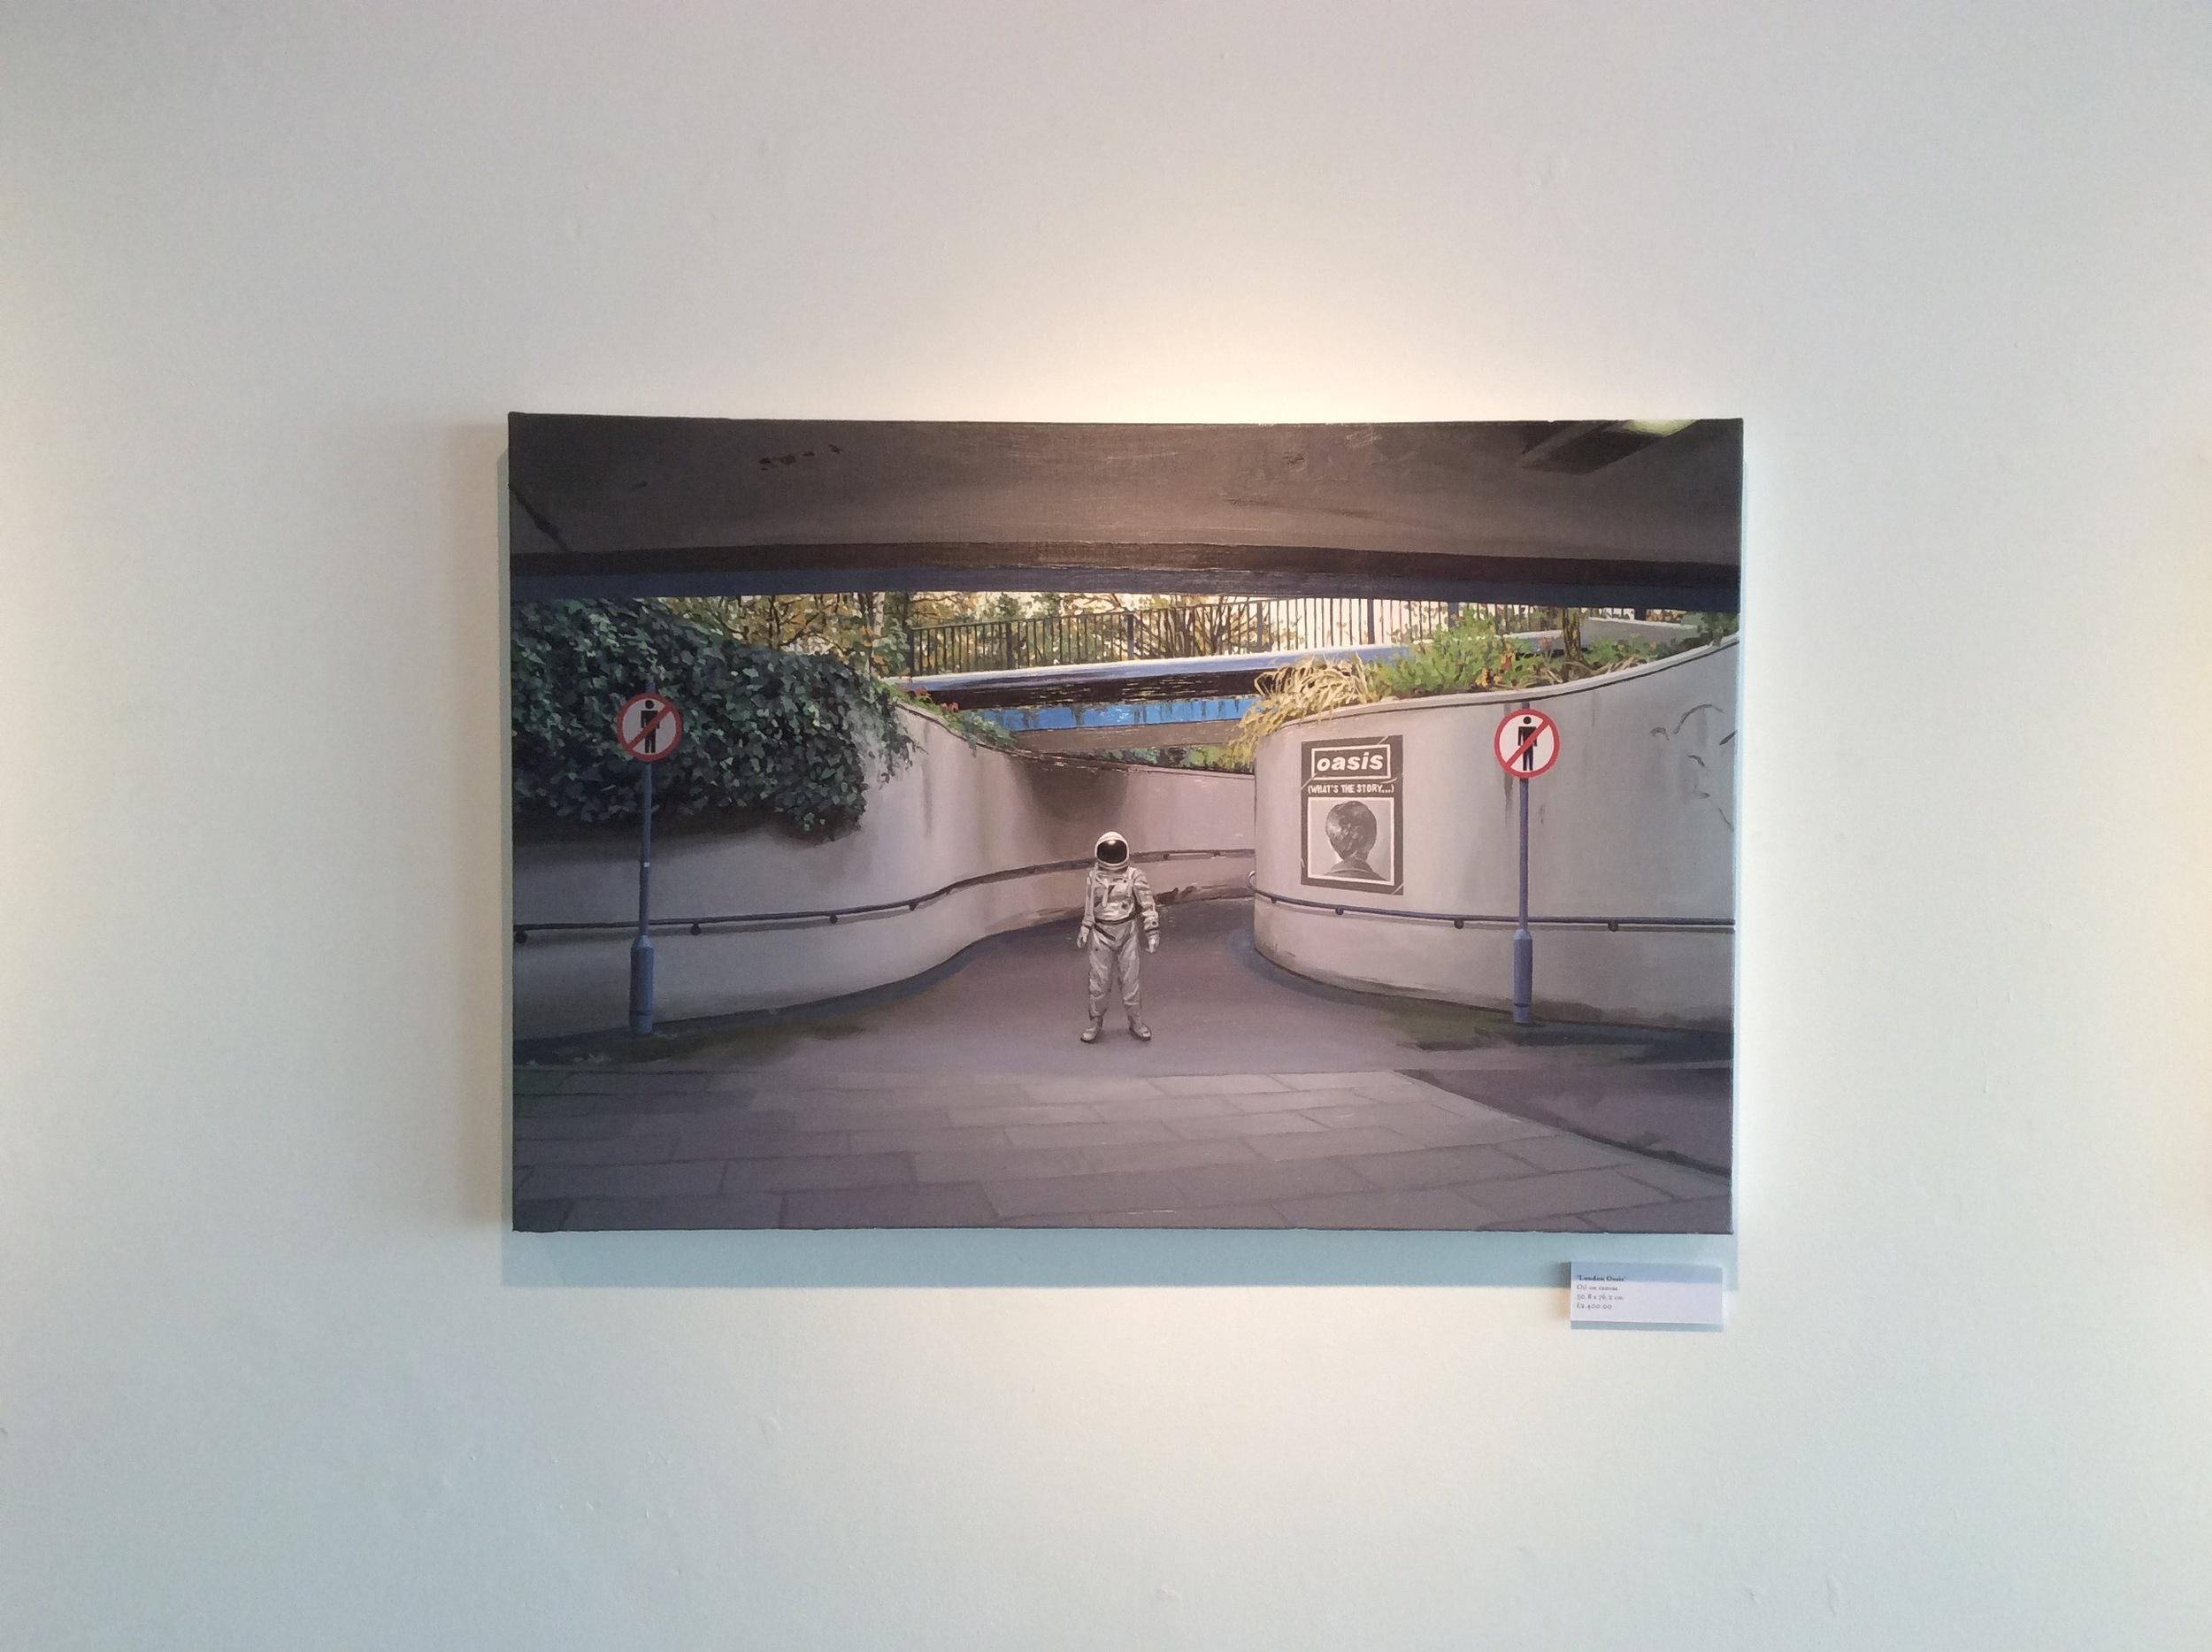 Scott Listfield, London Oasis, c.2016, Oil on canvas.